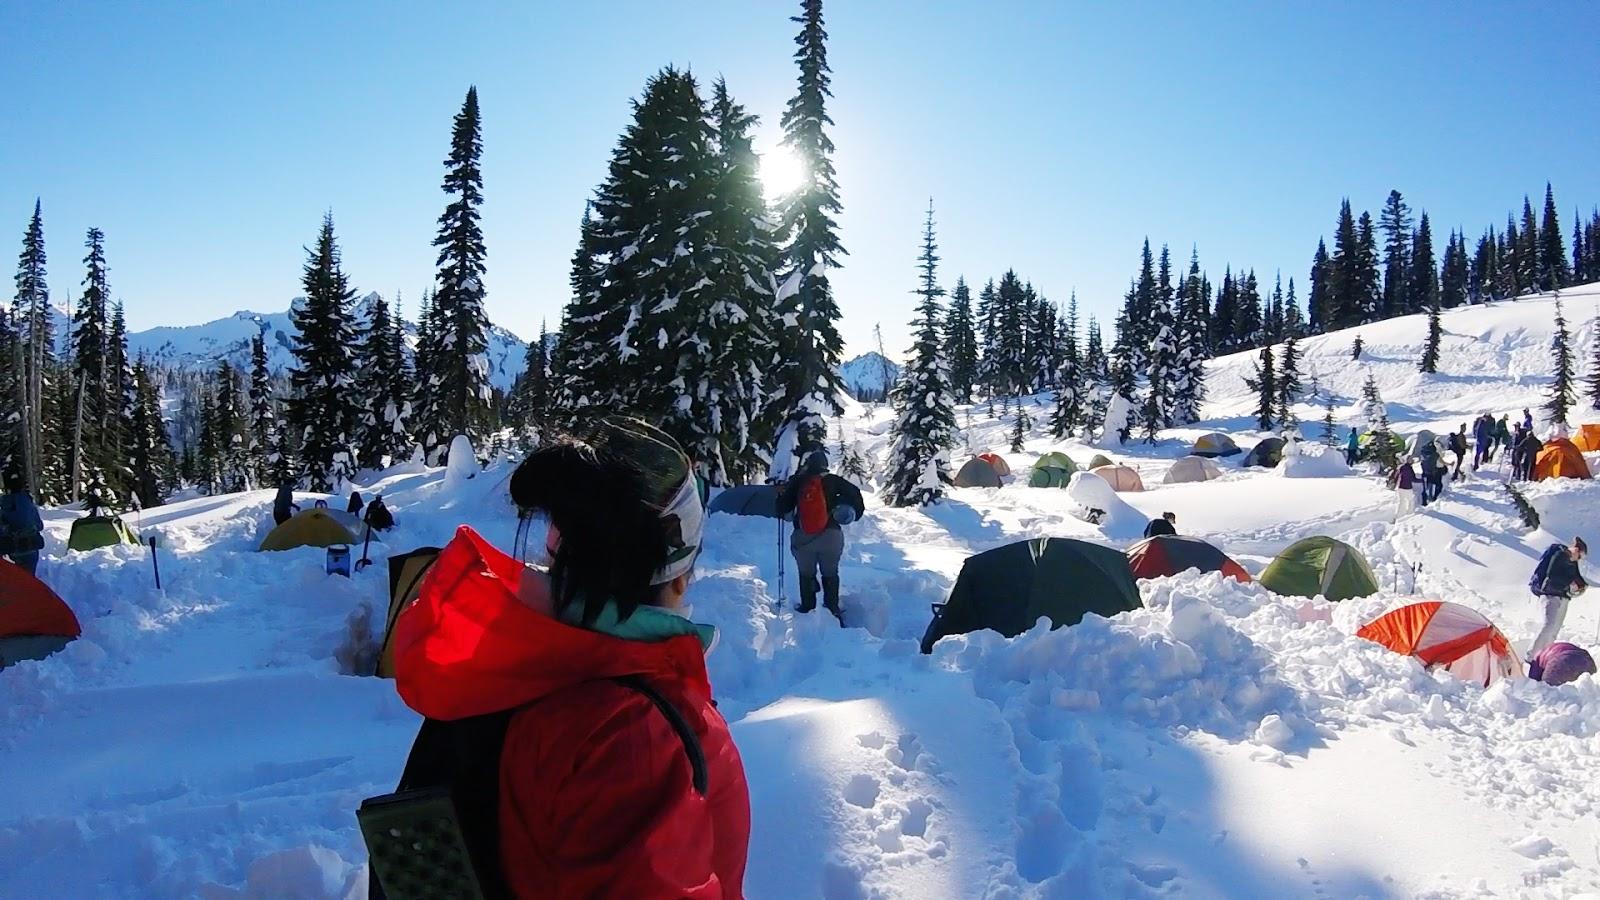 Doris the Explorist: Snow Camping 101 - Mt. Rainier Edition